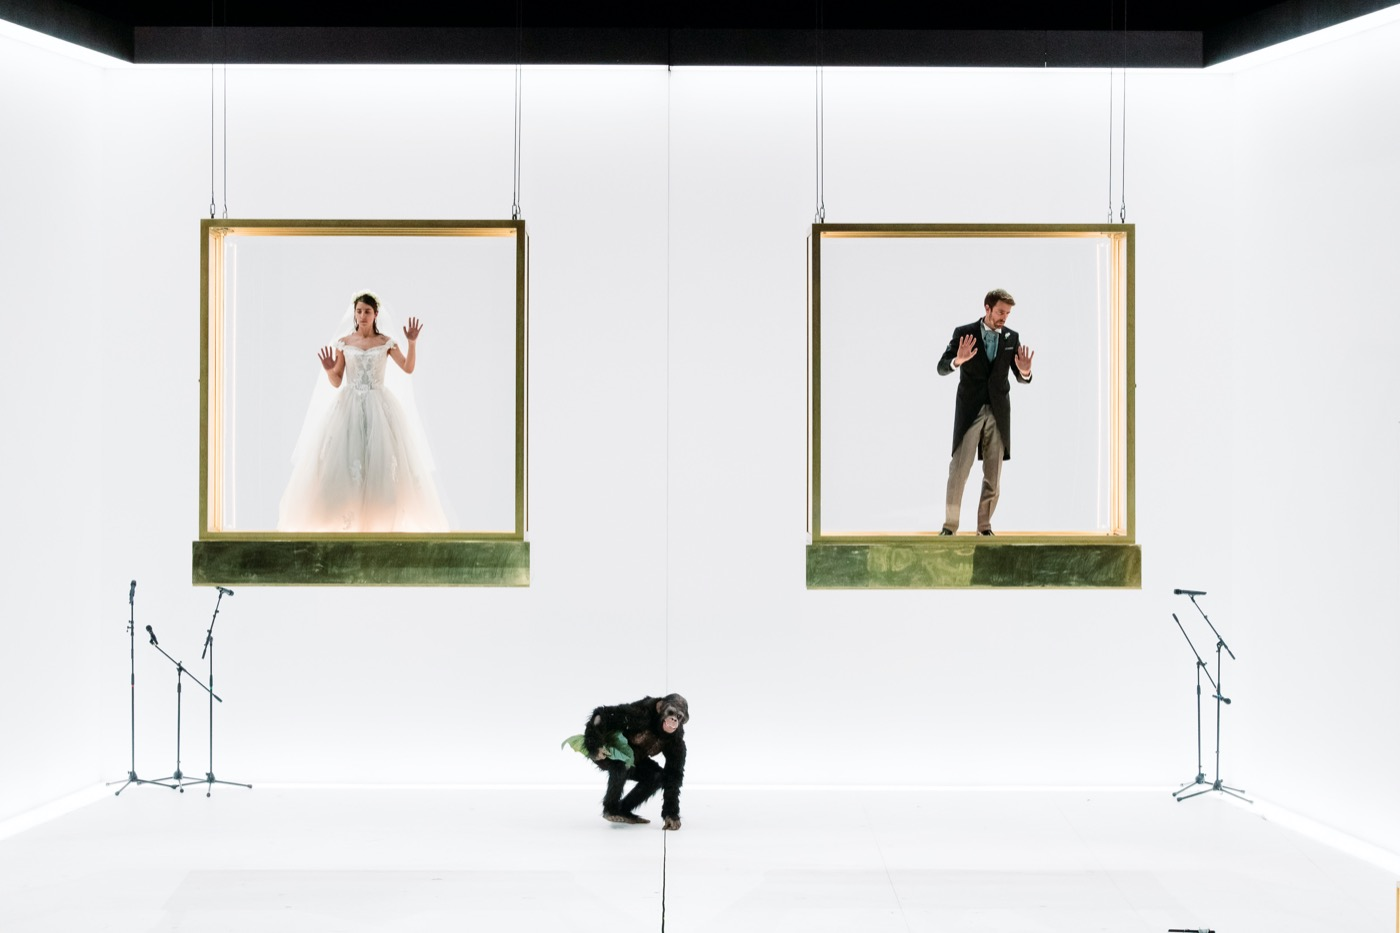 Set design Paolo-Fantin-Damiano-Michieletto-Beatrice-et-Benedict-Blandine-Soulage-01100.jpg